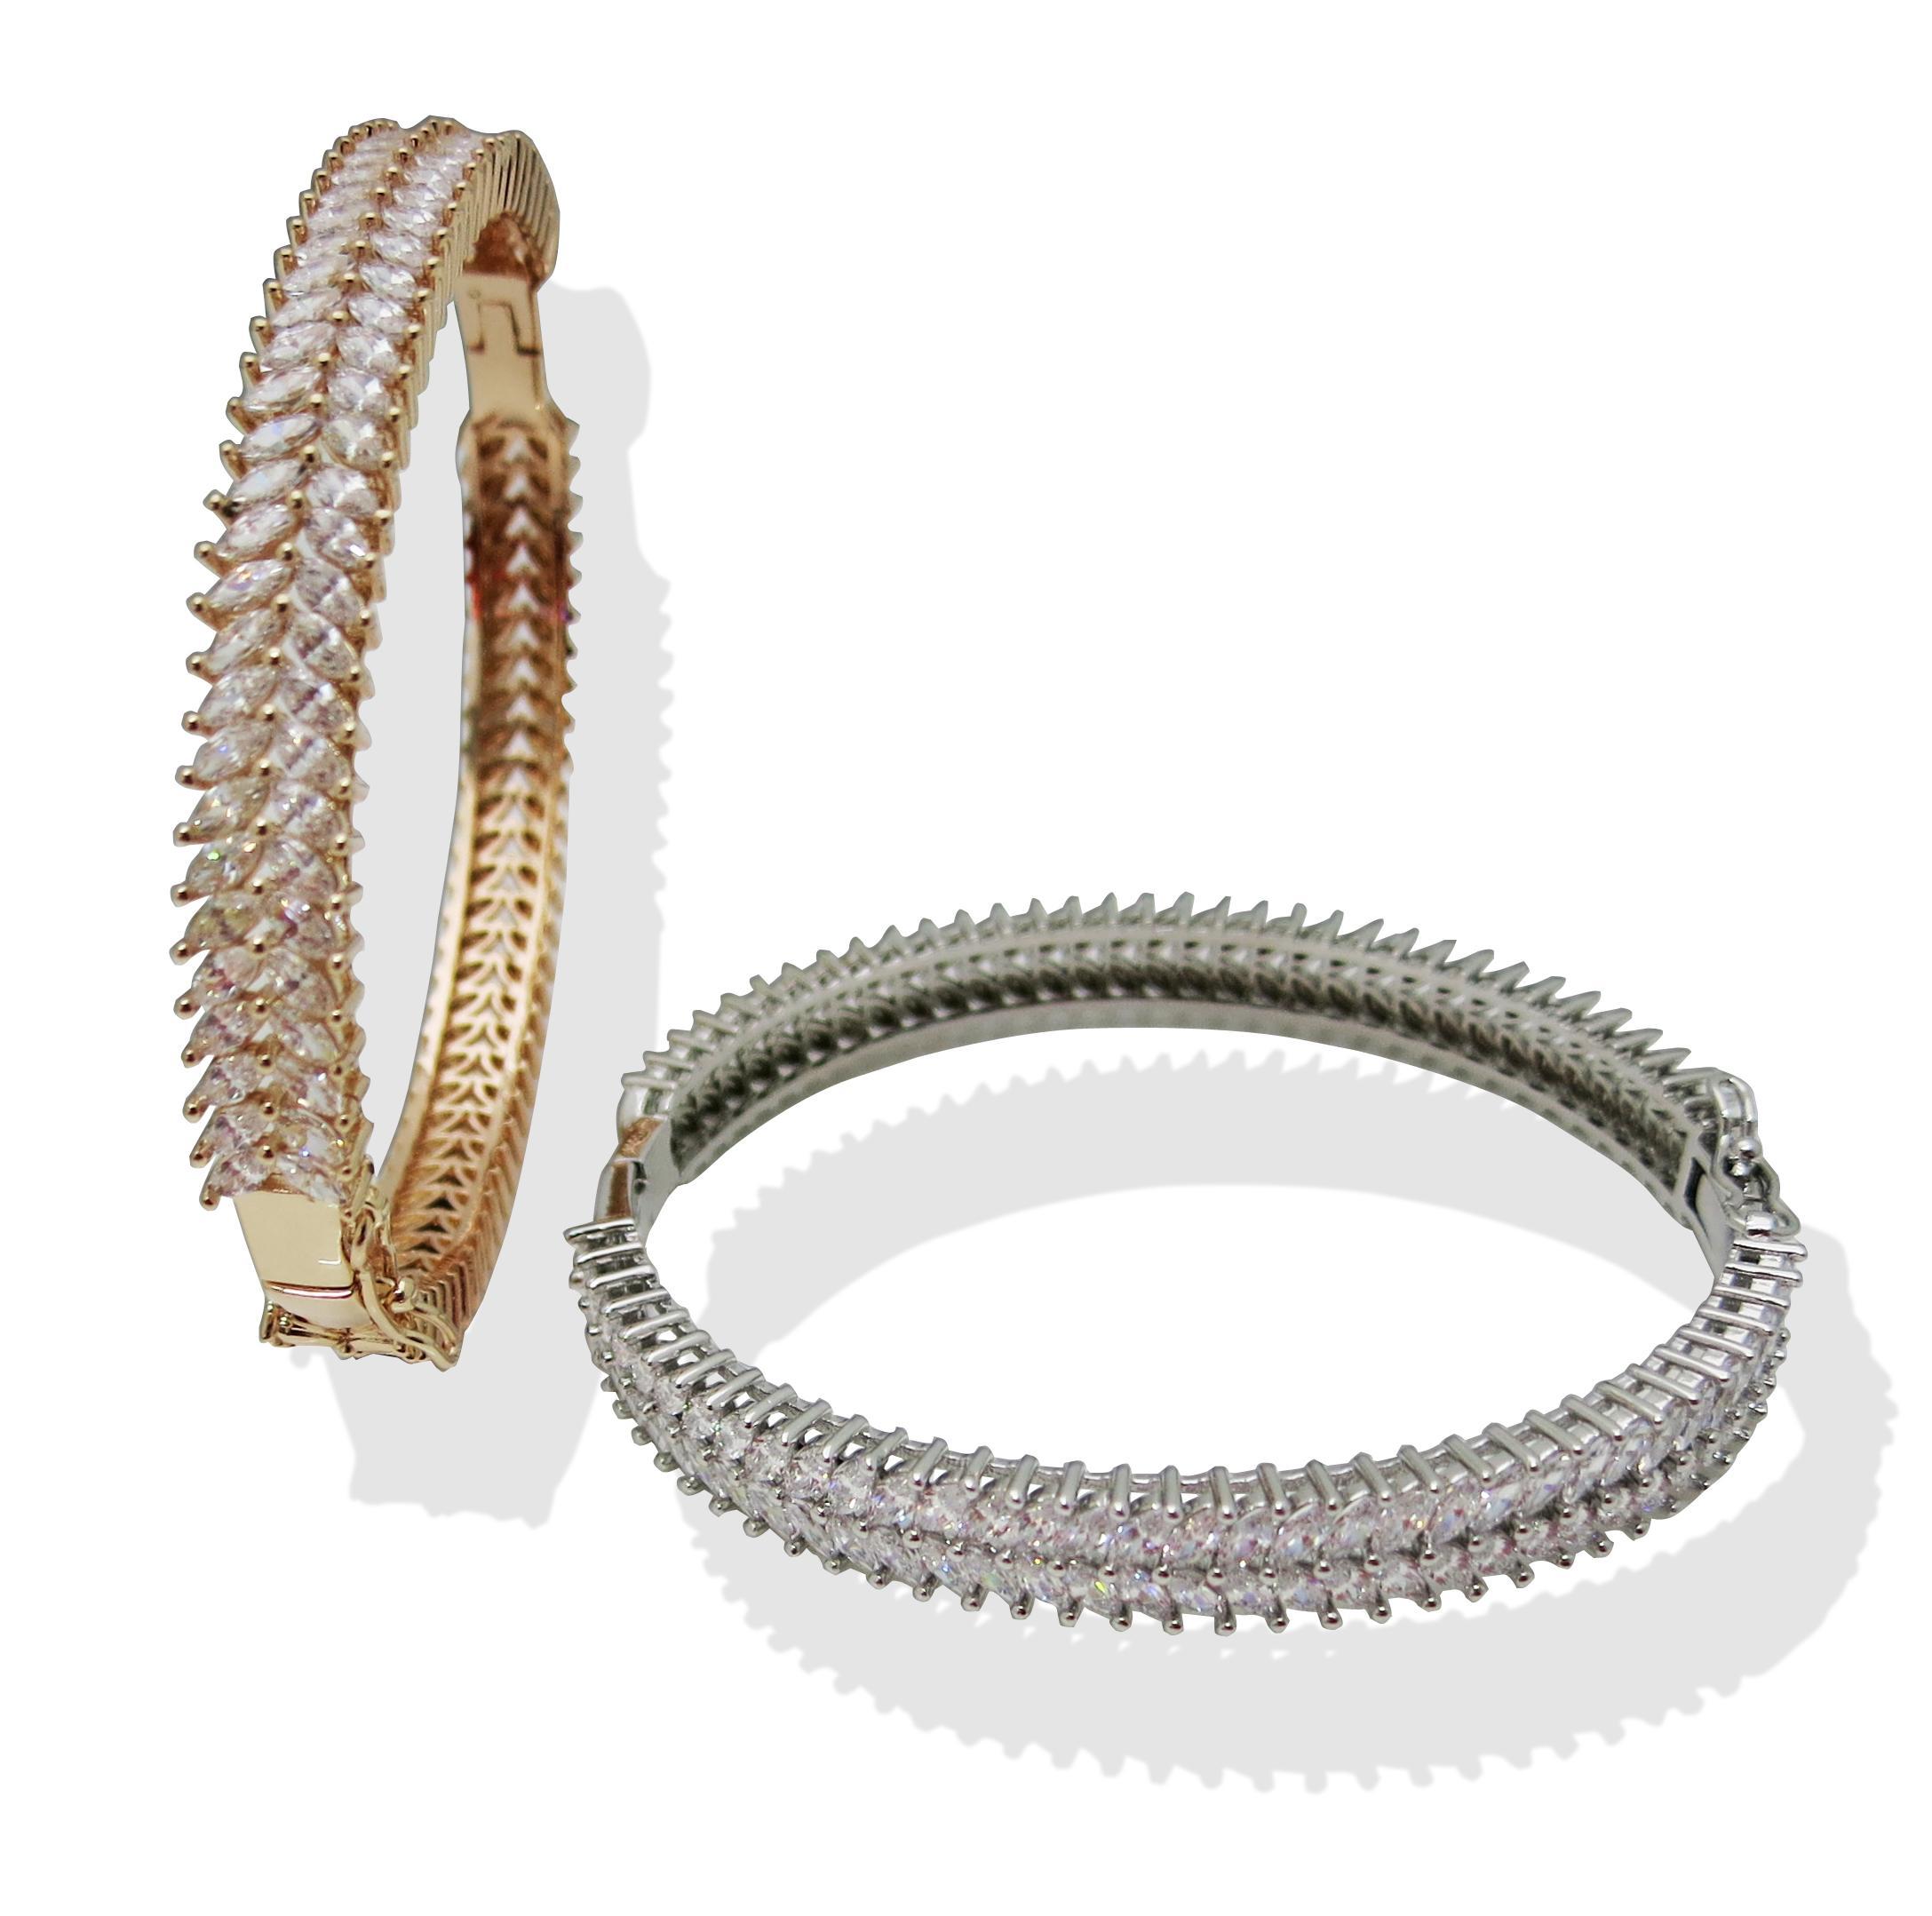 Gold Silver Bangles For Women Men Hand Fashion Jewelry Designer Luxury Love Bracelet Gemstone Bangle From Huierjewellrey 4 58 Dhgate Com